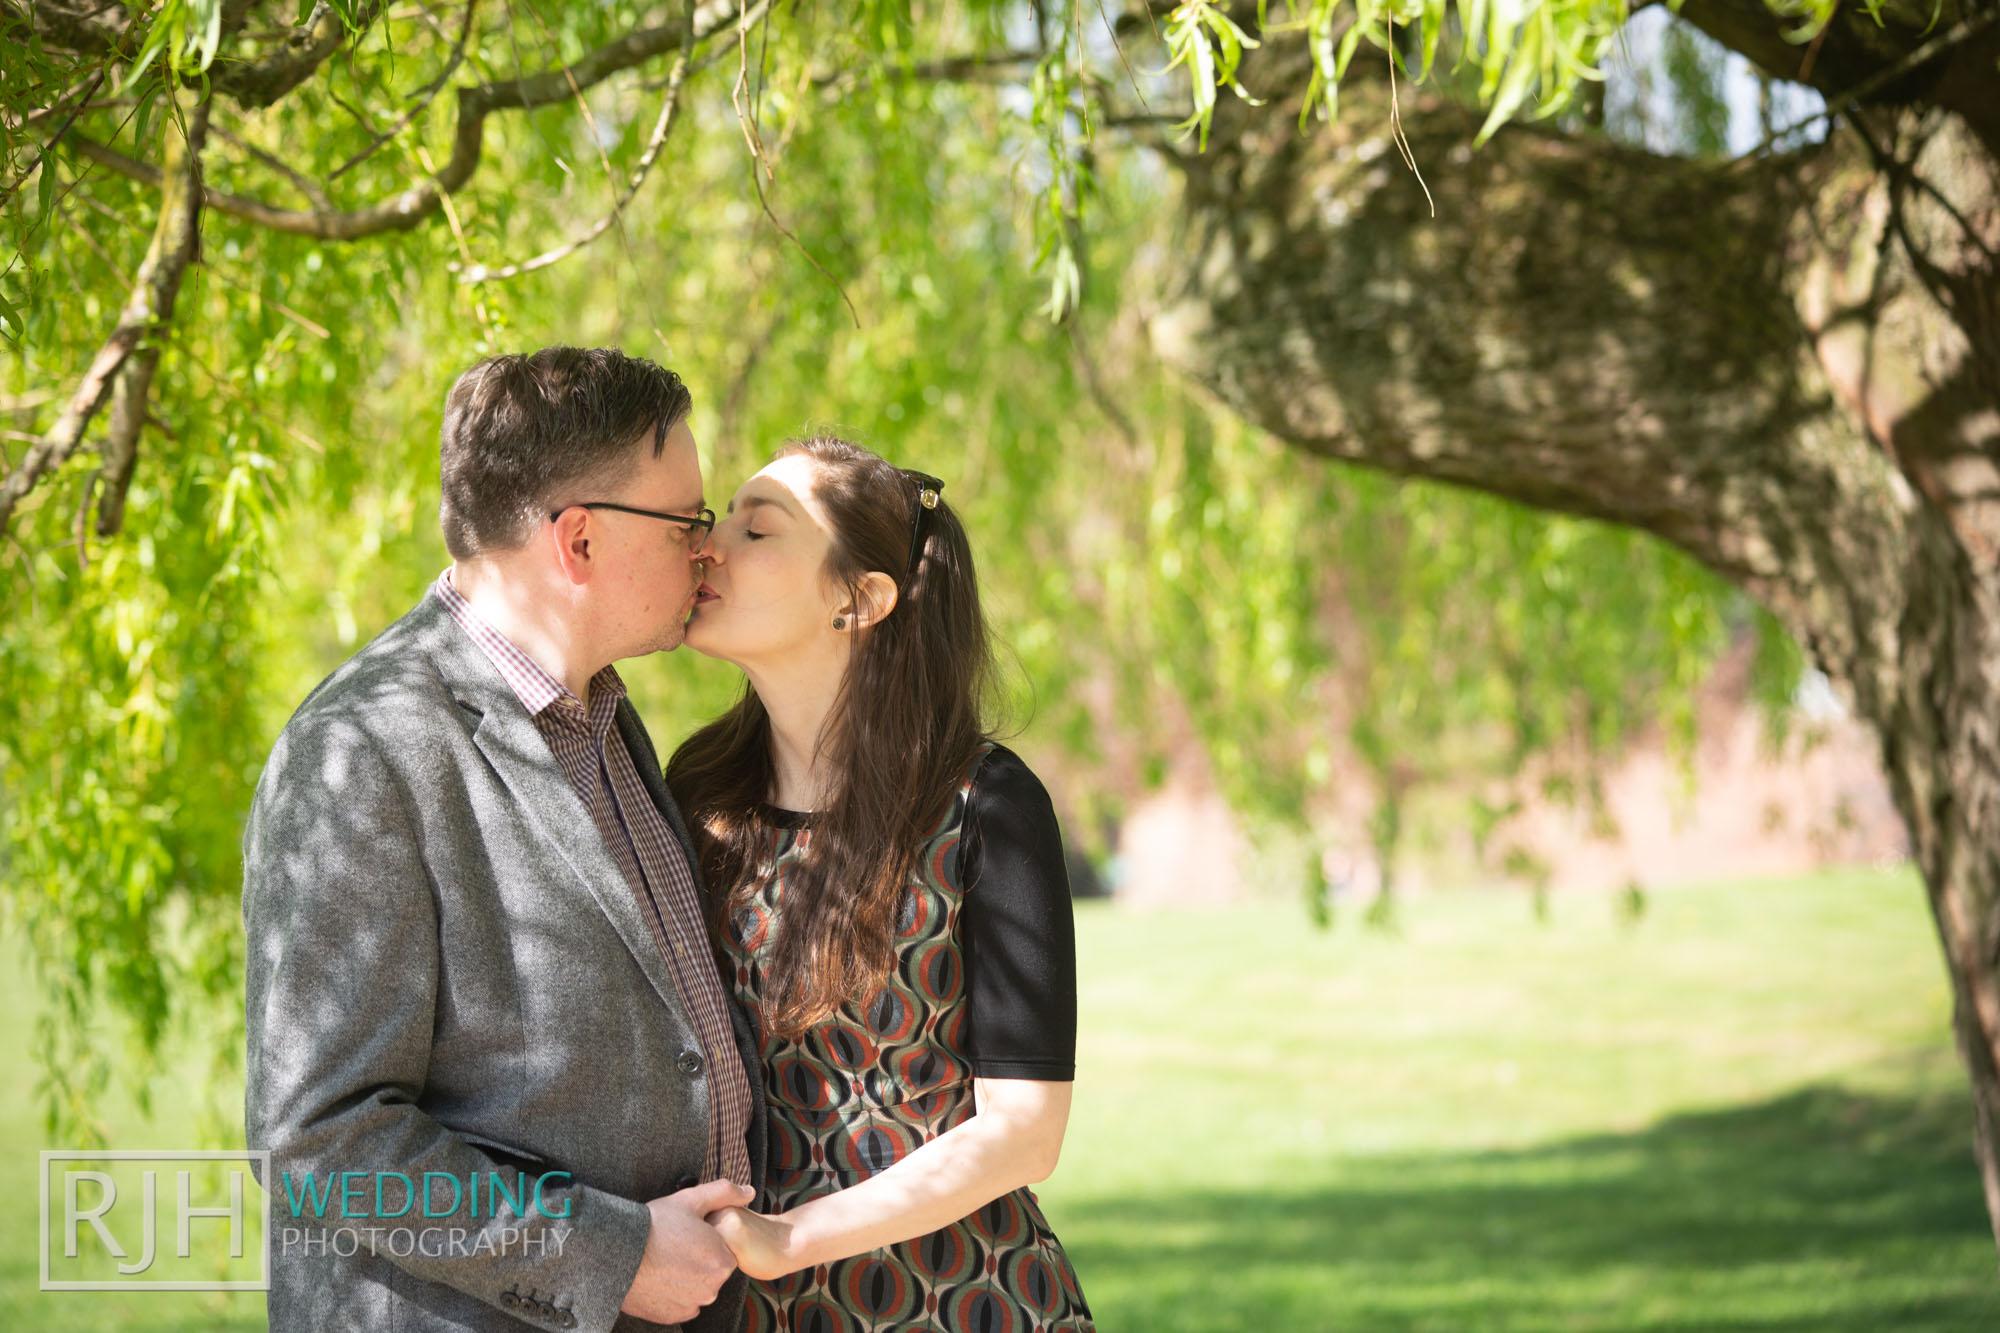 Pre-wedding photography - Richard & Rachel_002_3C2A8107.jpg